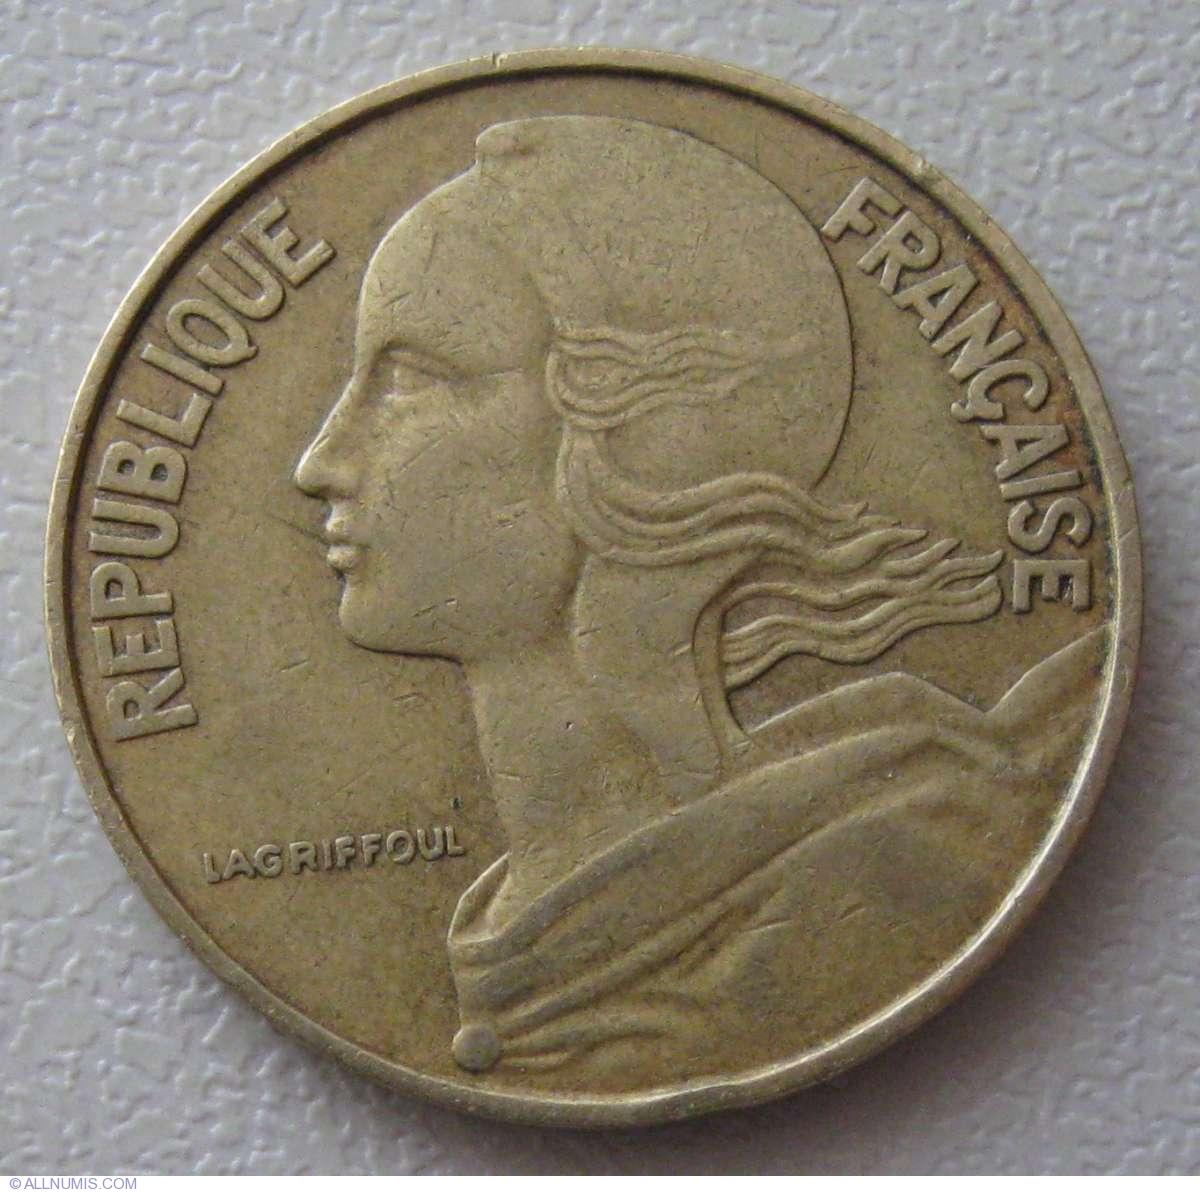 20 Centimes 1964, Fifth Republic (1958-1970)